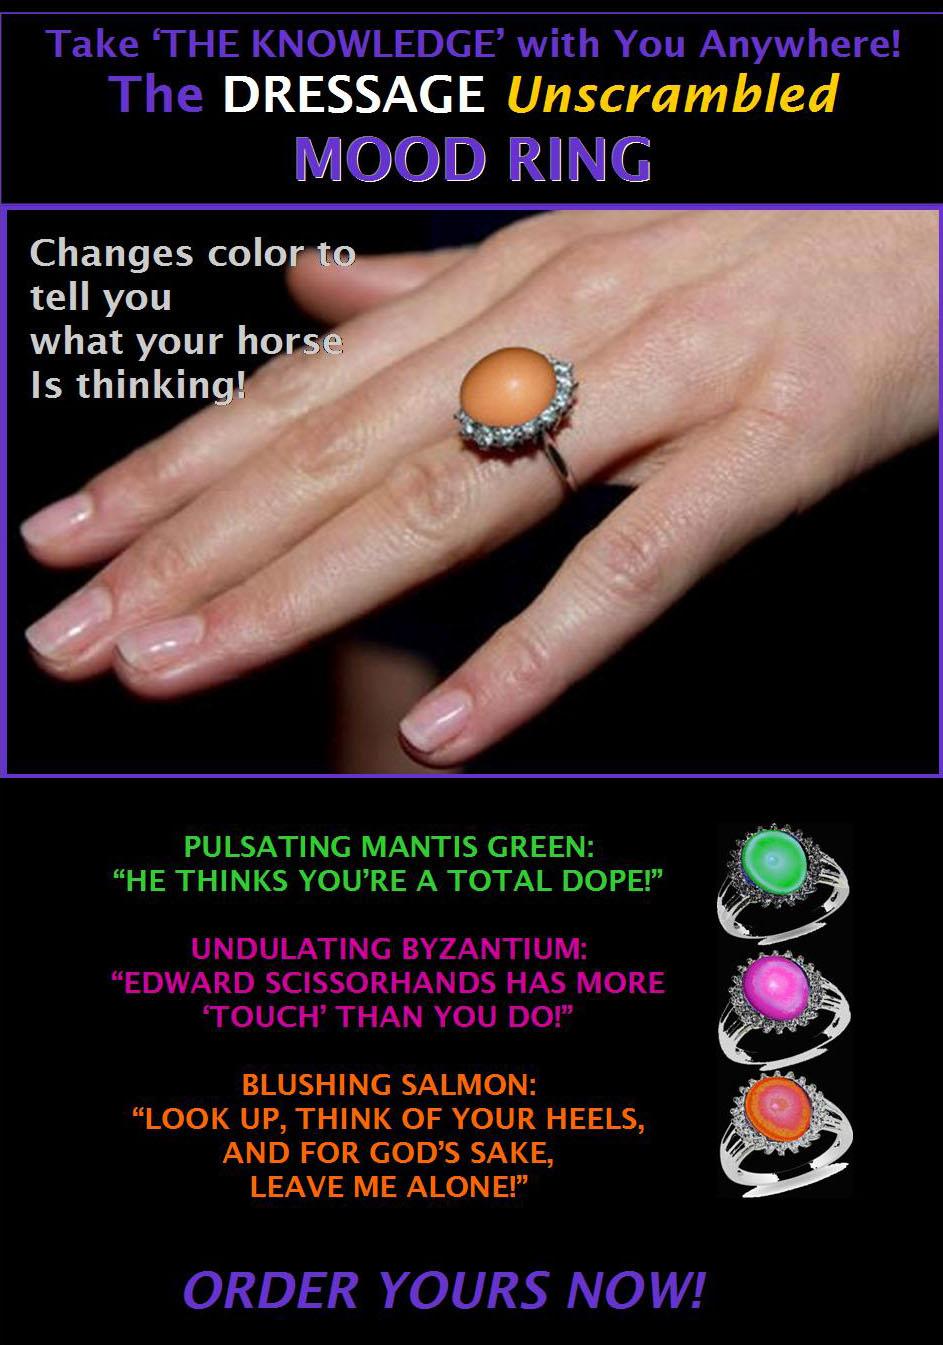 23-mood-ring